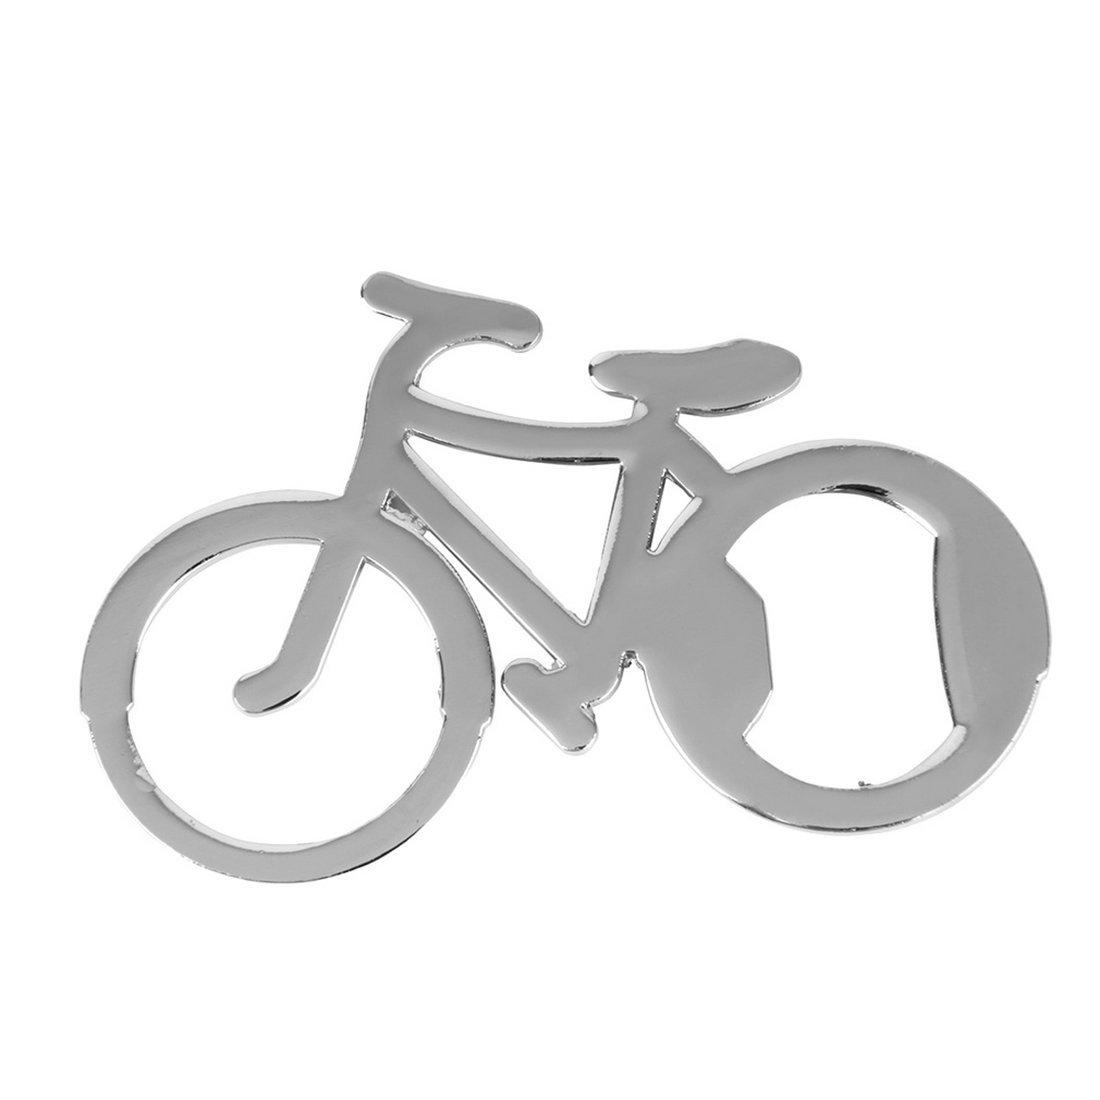 joyliveCY Moderner netter Fahrrad Metall Bier Flaschen?ffner Schl¨¹sselanh?nger Schl¨¹sselanh?nger f¨¹r Fahrrad Liebhaber Radfahrer kreative Geschenk [Energieklasse A] CY-Buity TRTA11A